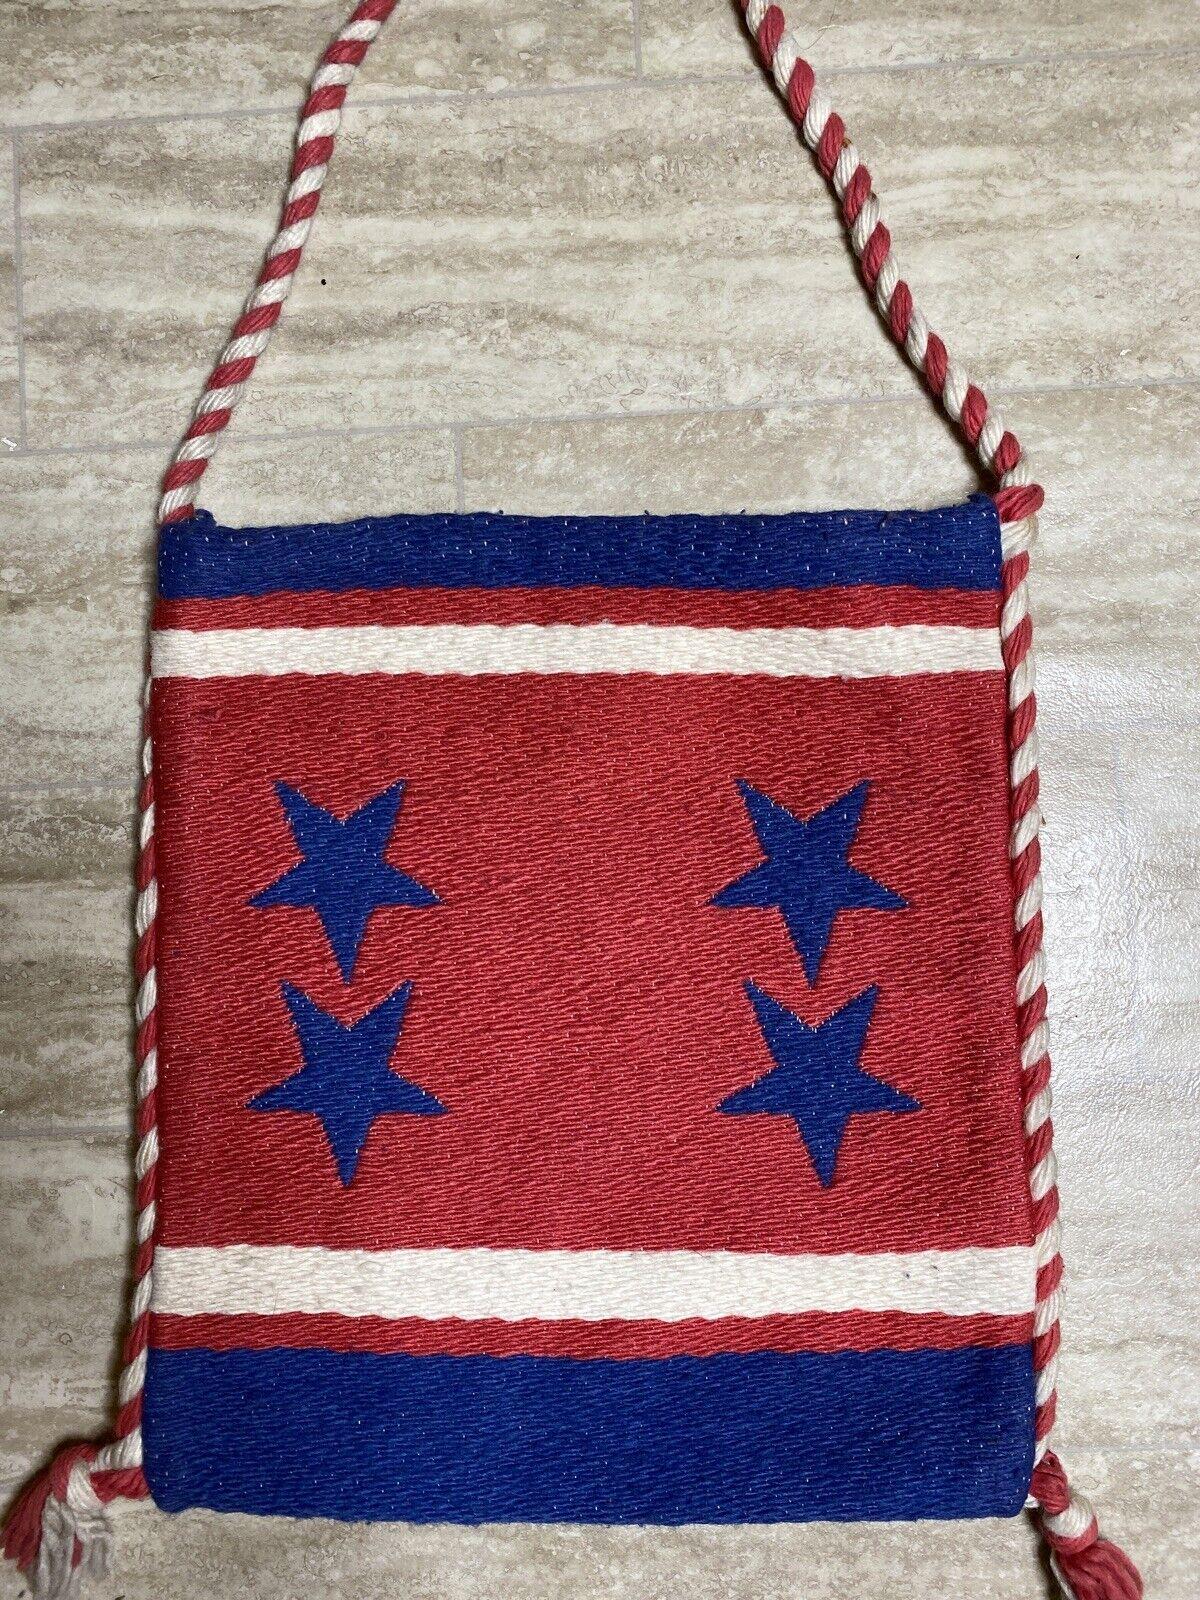 Vintage Made In Greece Spun Rayon Red White Blue Crossbody Bag Purse